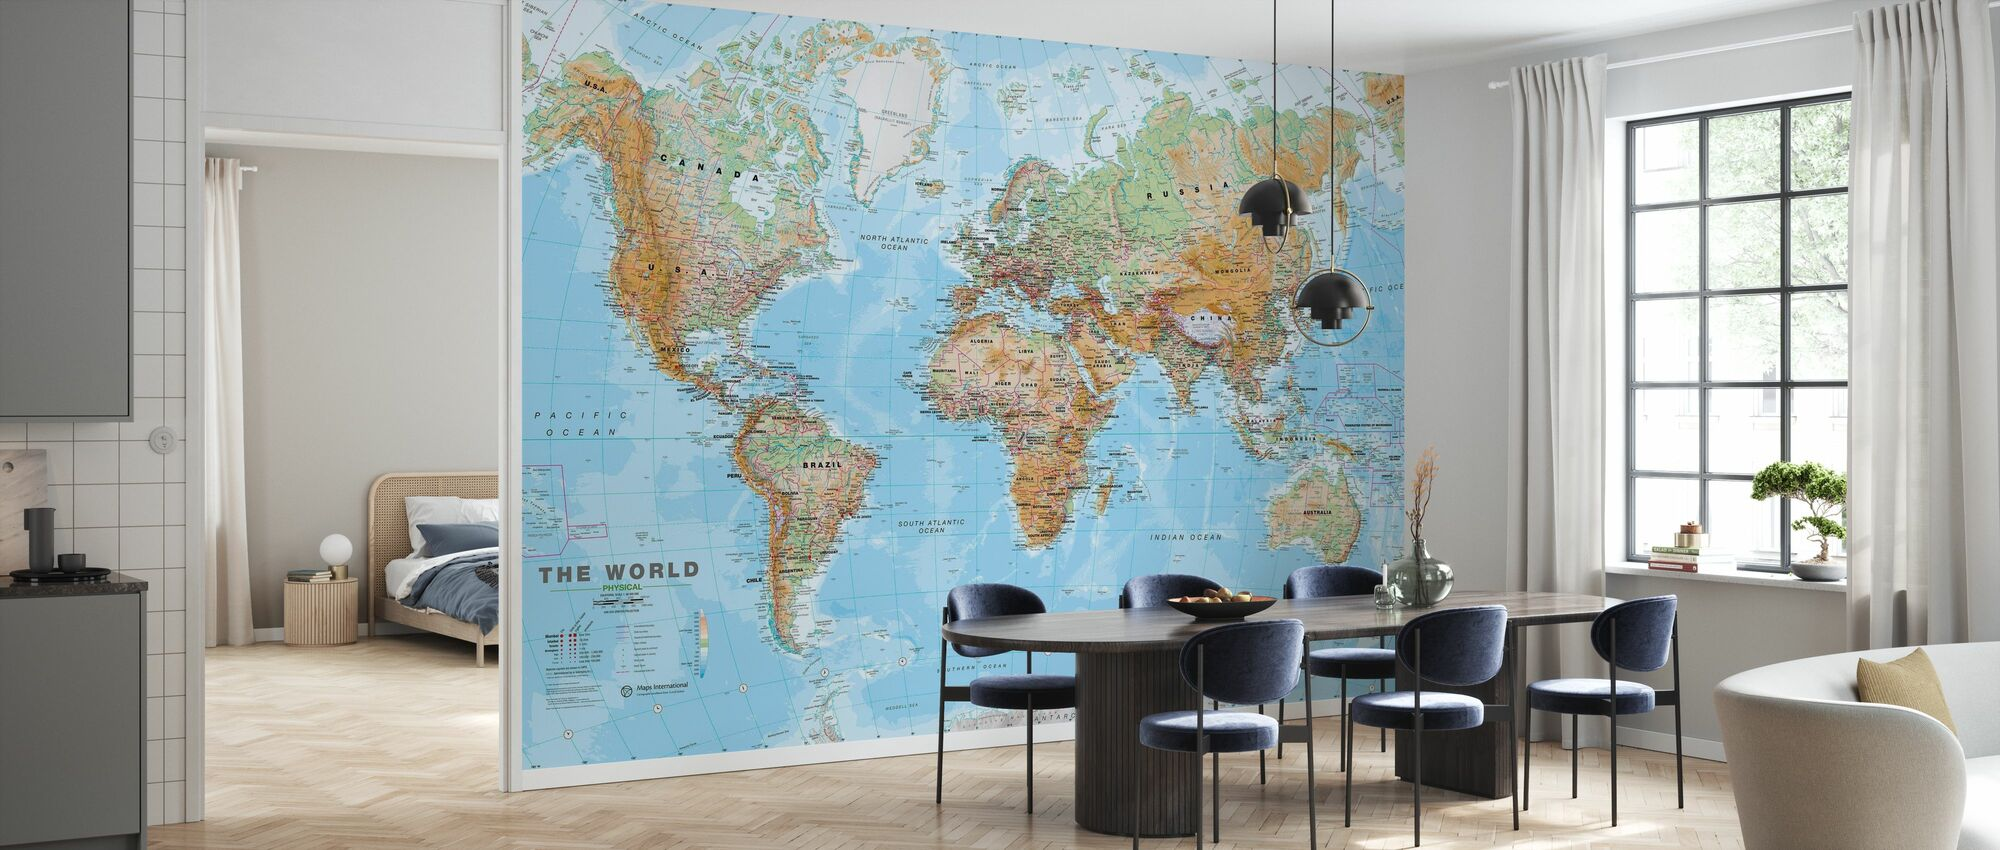 World Map Physical - Wallpaper - Kitchen